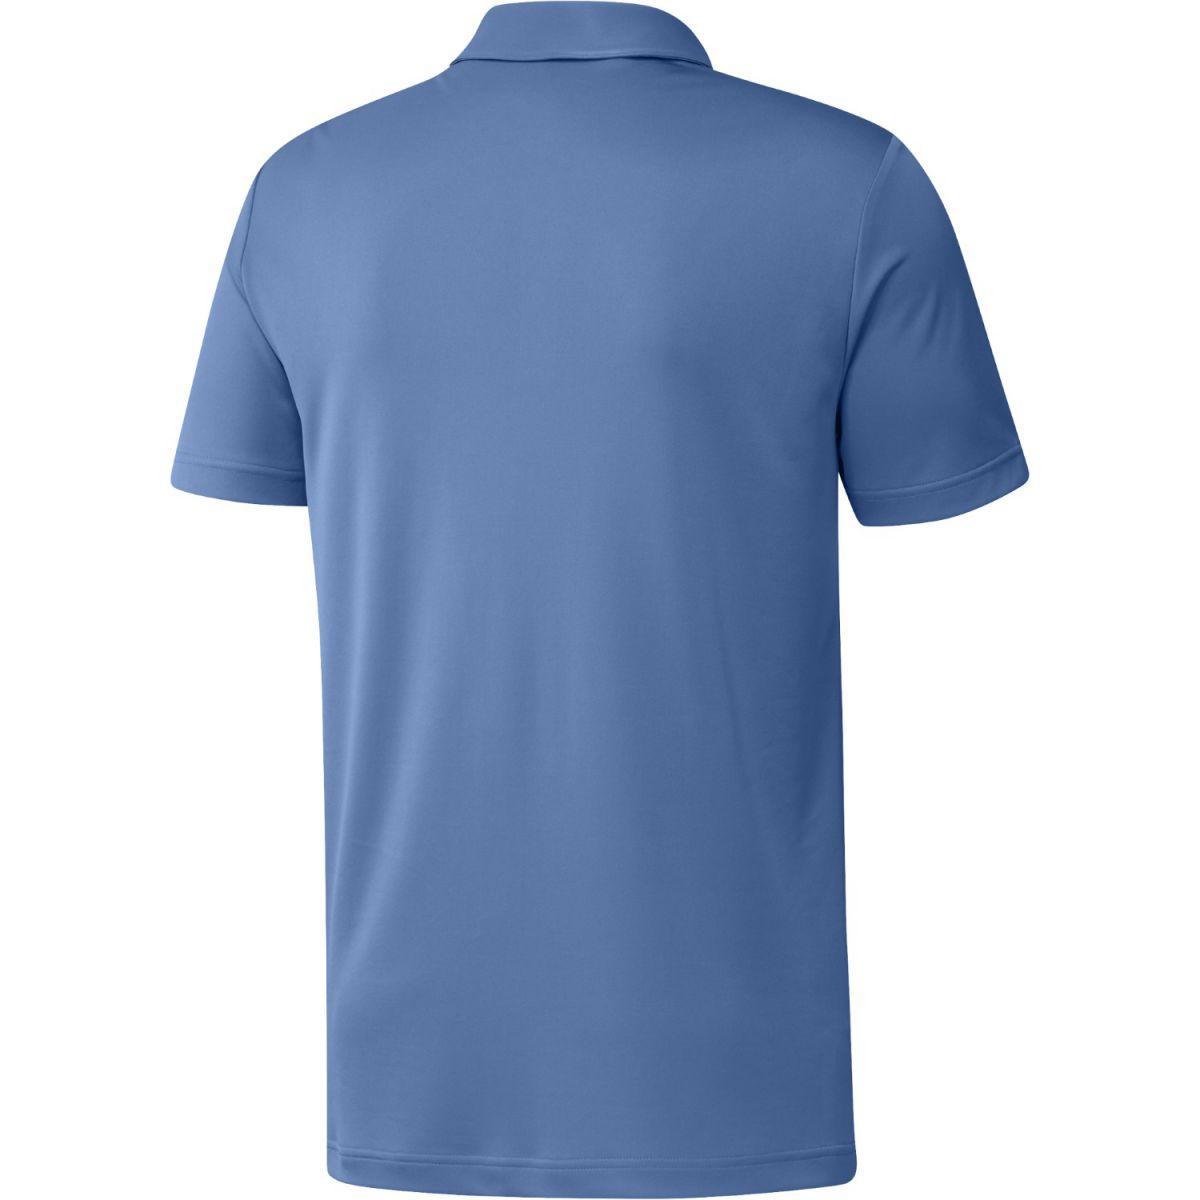 adidas polo chest print blue s